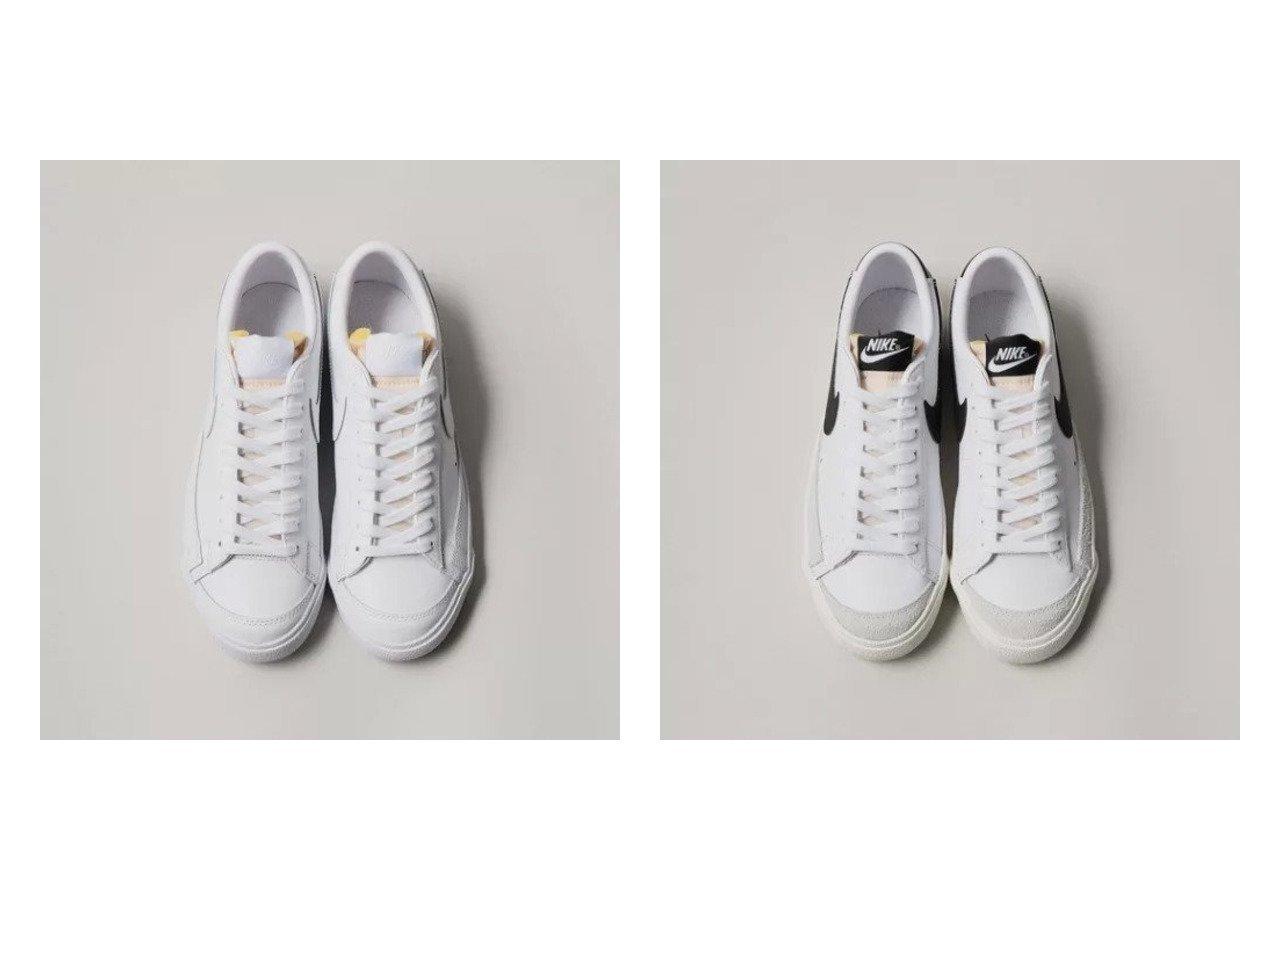 【Odette e Odile/オデット エ オディール】のNIKE ブレーザーLow77 【シューズ・靴】おすすめ!人気、トレンド・レディースファッションの通販  おすすめで人気の流行・トレンド、ファッションの通販商品 メンズファッション・キッズファッション・インテリア・家具・レディースファッション・服の通販 founy(ファニー) https://founy.com/ ファッション Fashion レディースファッション WOMEN シューズ シンプル スニーカー |ID:crp329100000034623